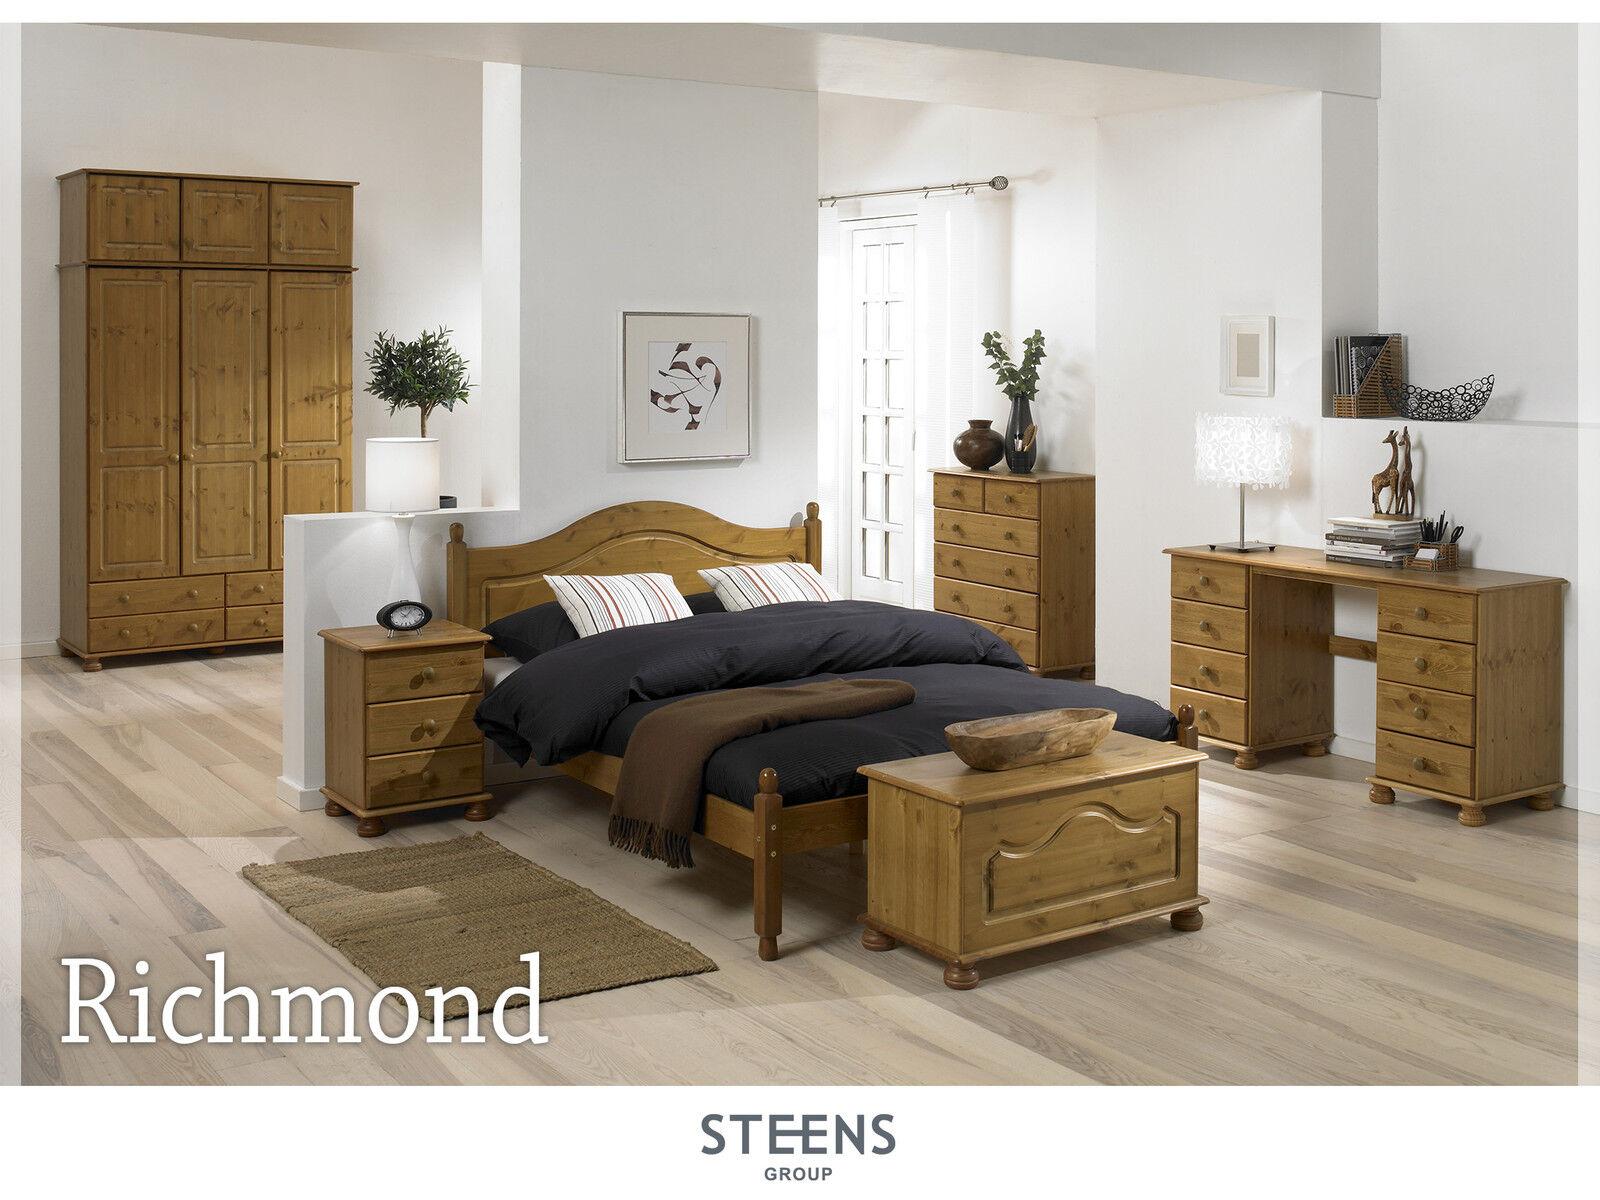 Richmond Cream Pine White Bedroom Furniture Wardrobes Chest Of Drawers Ebay